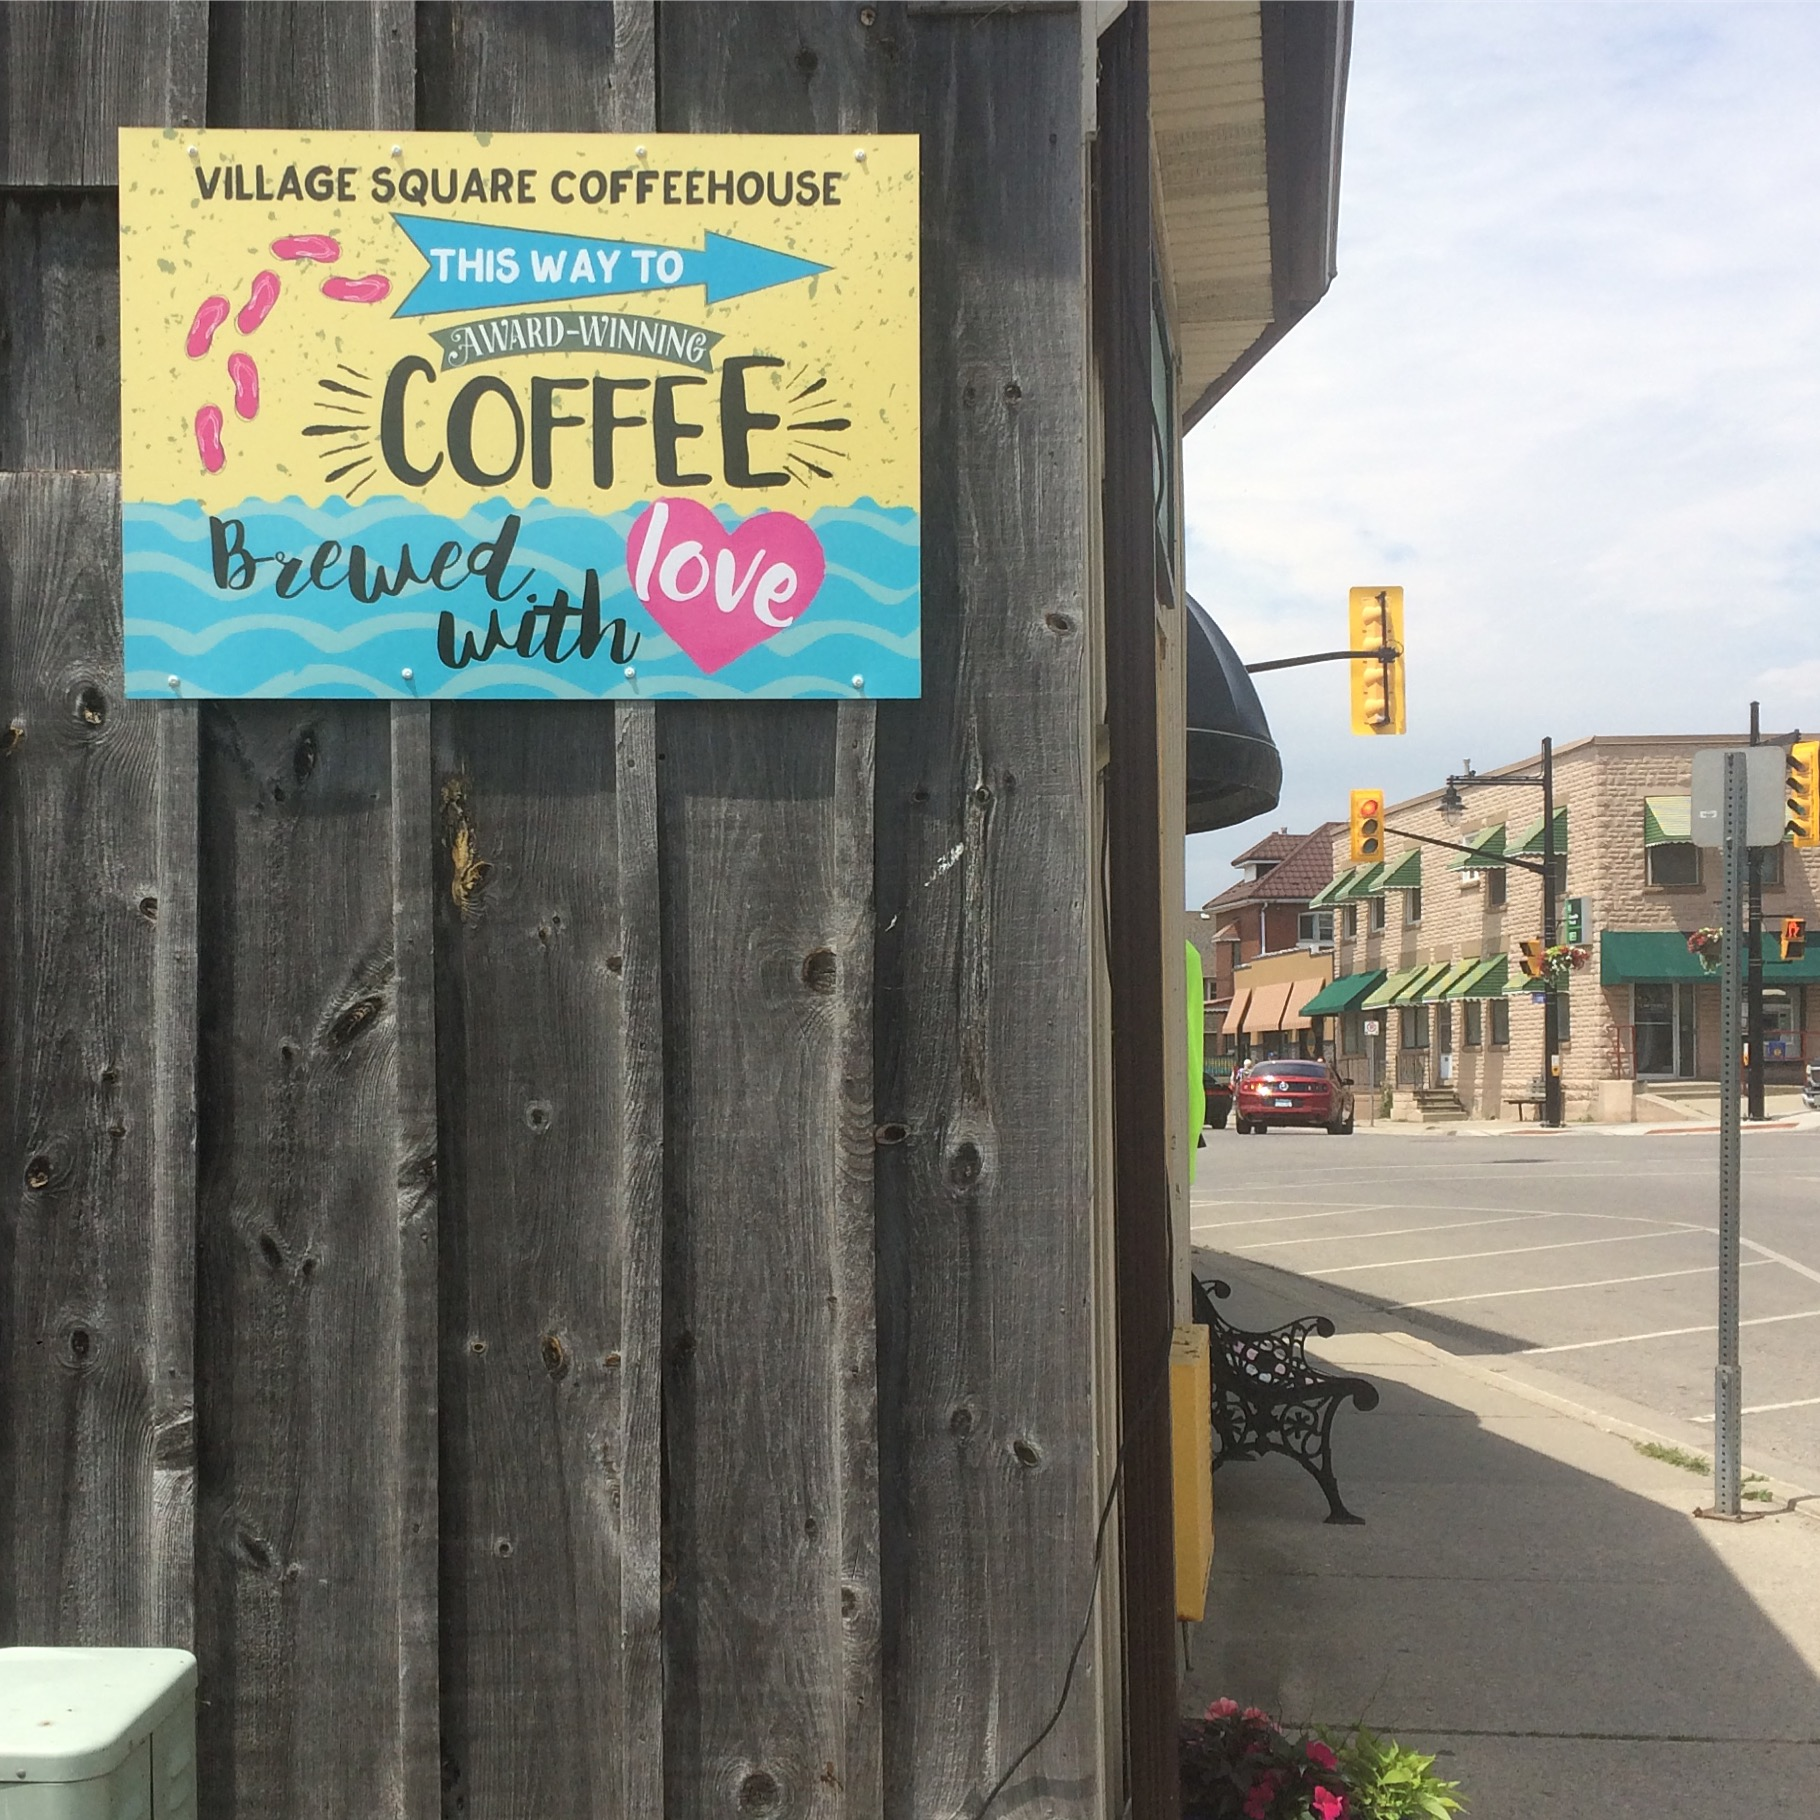 CoffeeHouse Signage.jpg